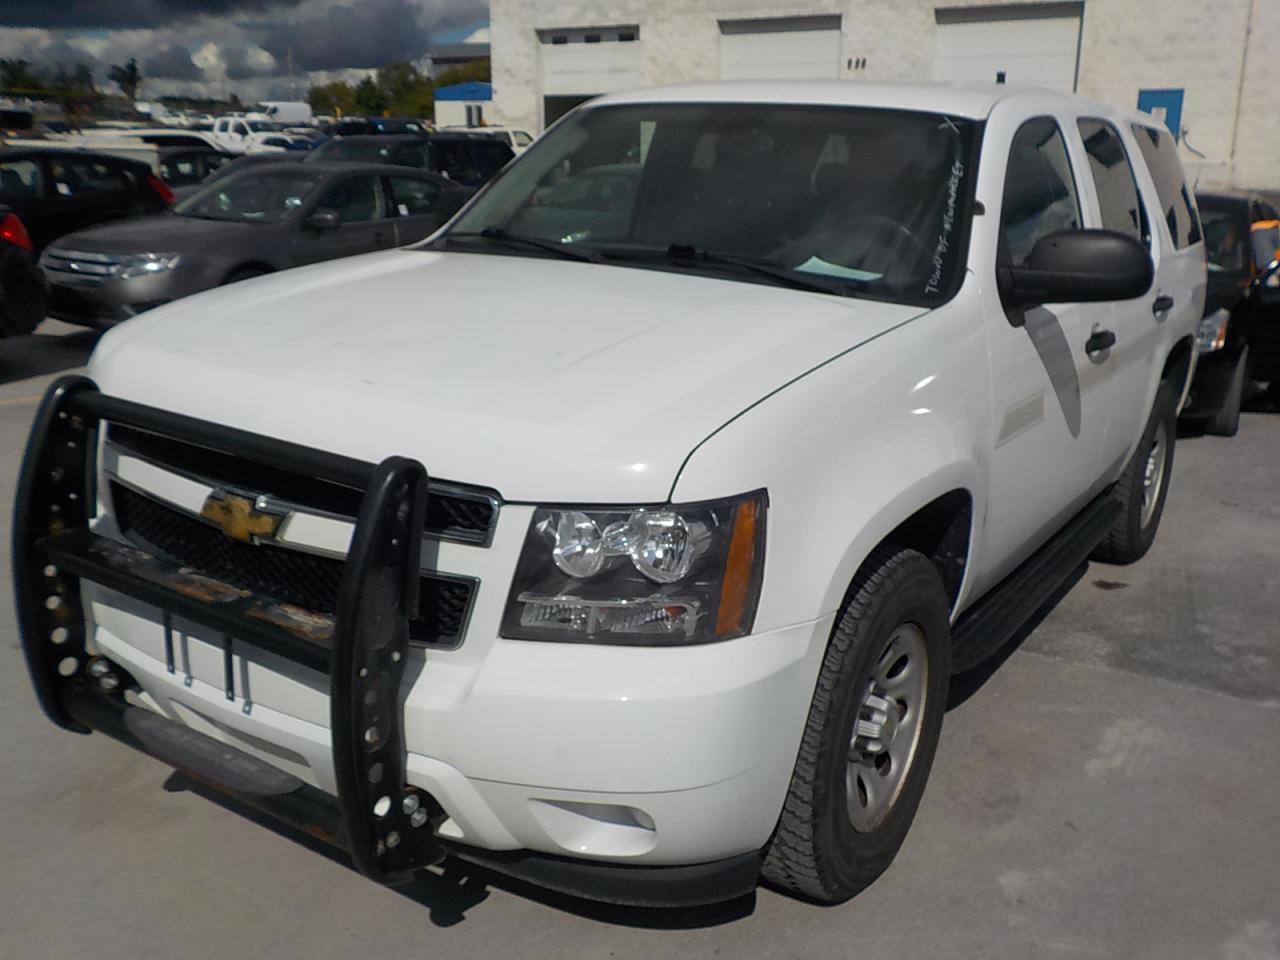 Photo of White 2008 Chevrolet Tahoe